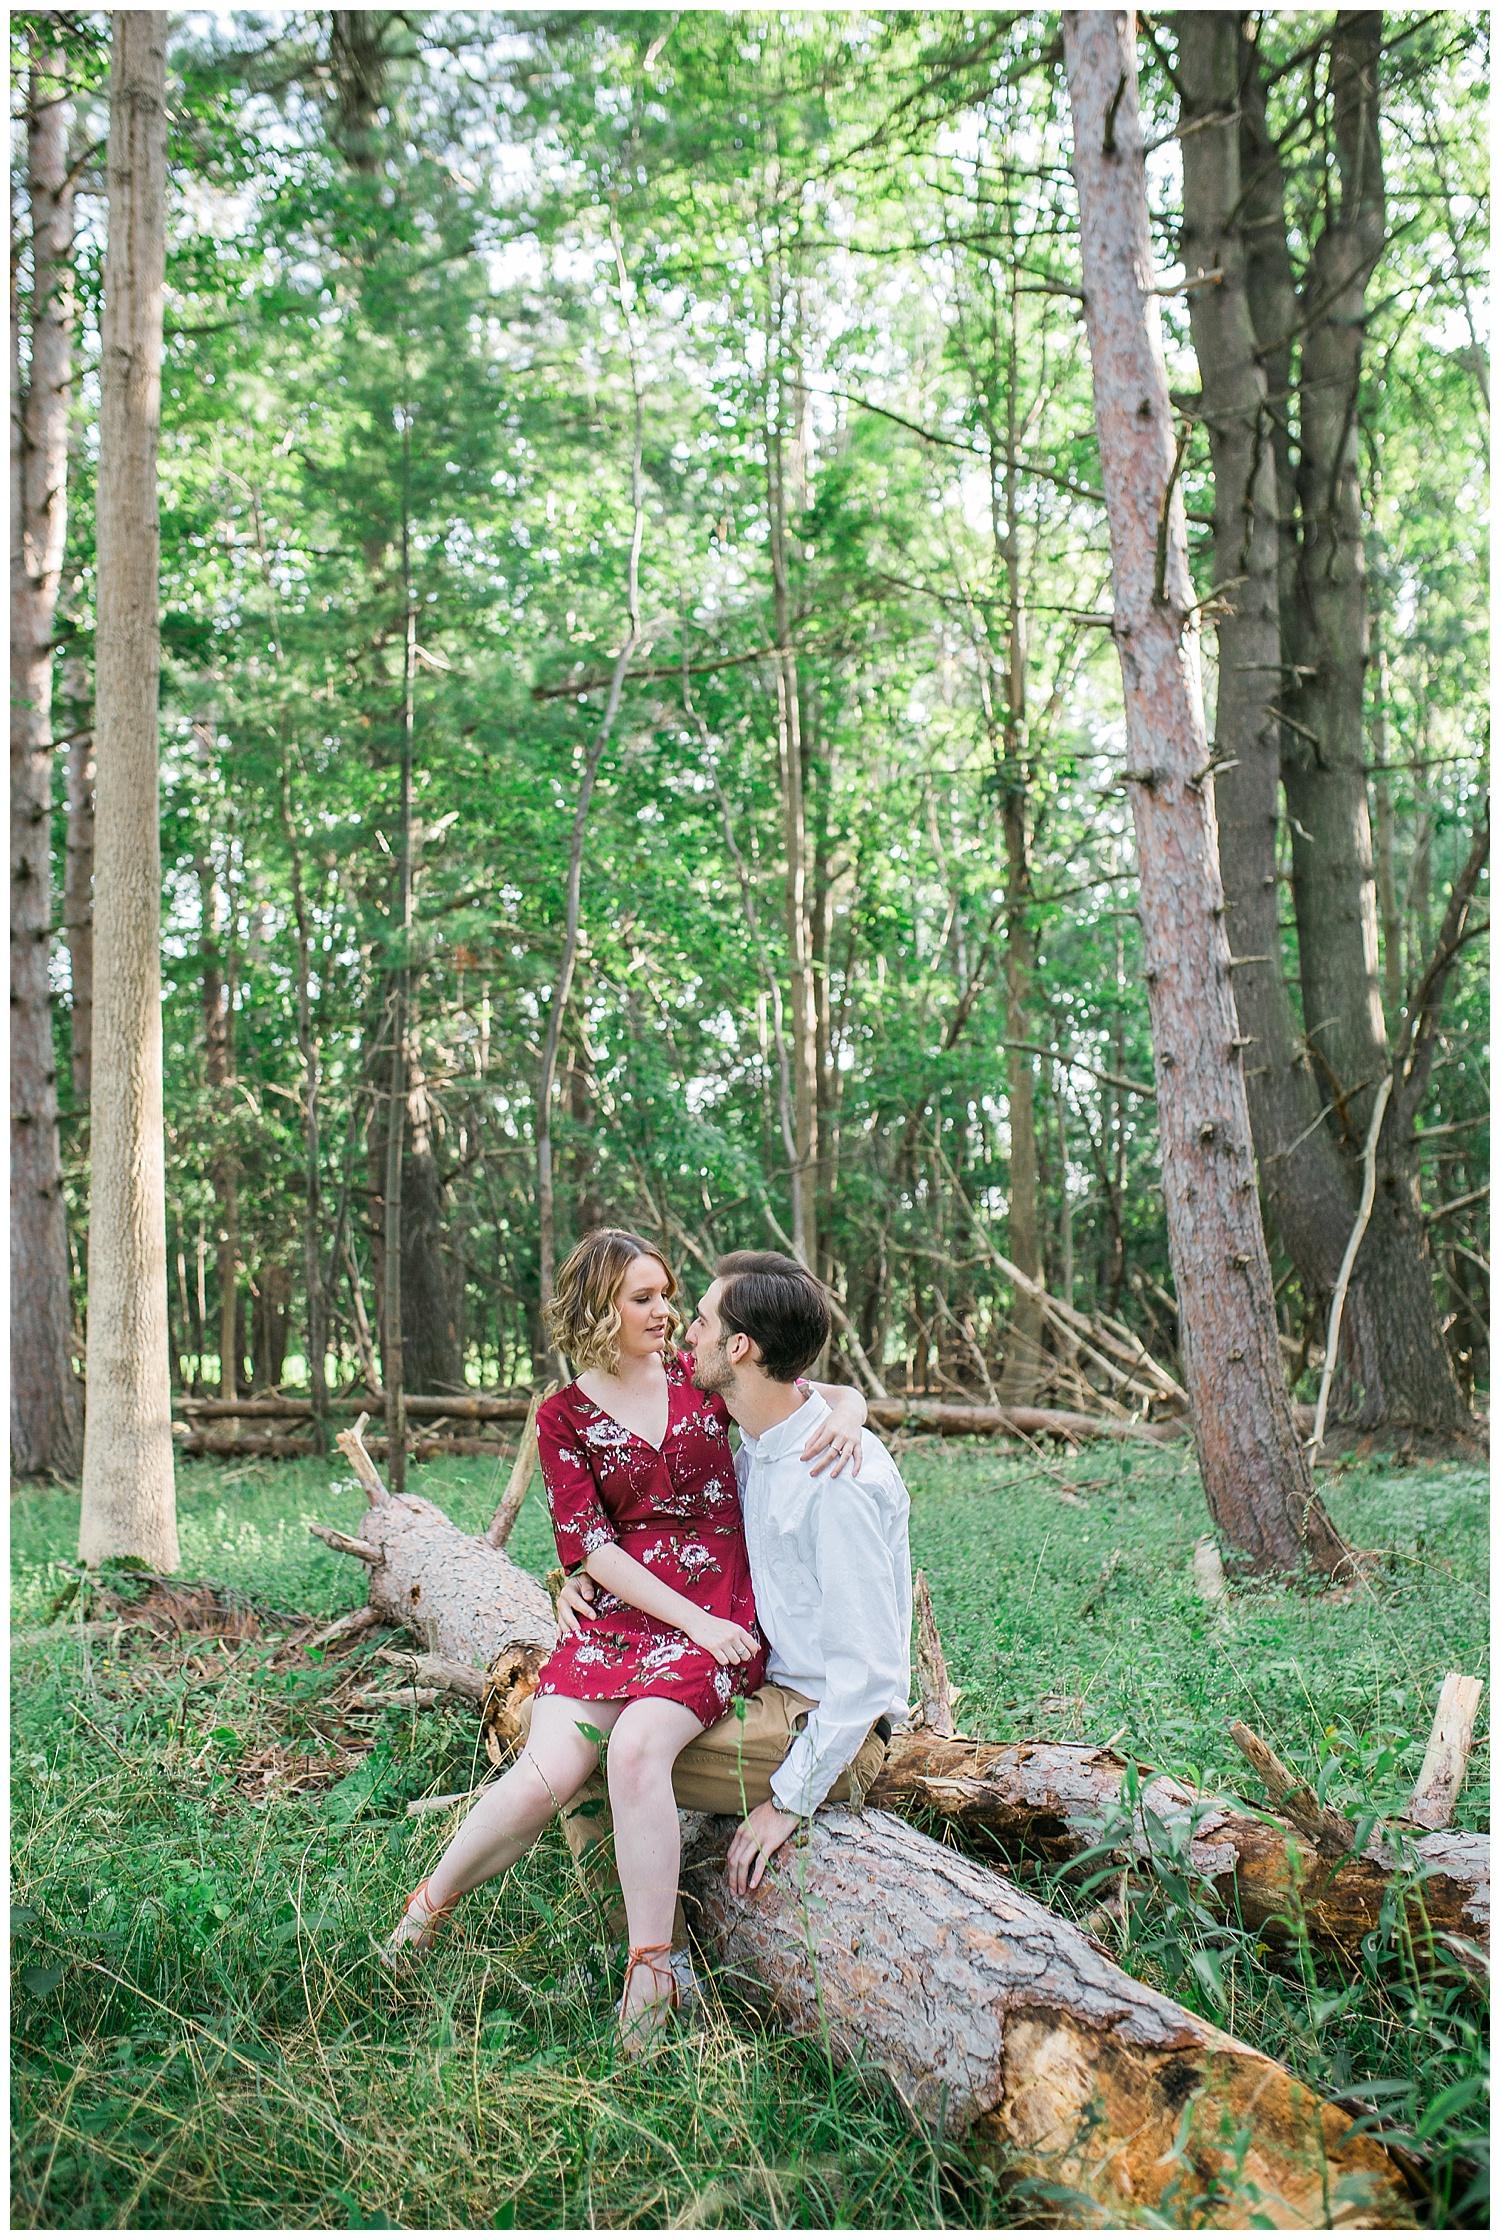 Tanya and Ryan - Sweetheart session - Lass & Beau - Geneseo NY-63_Buffalo wedding photography.jpg